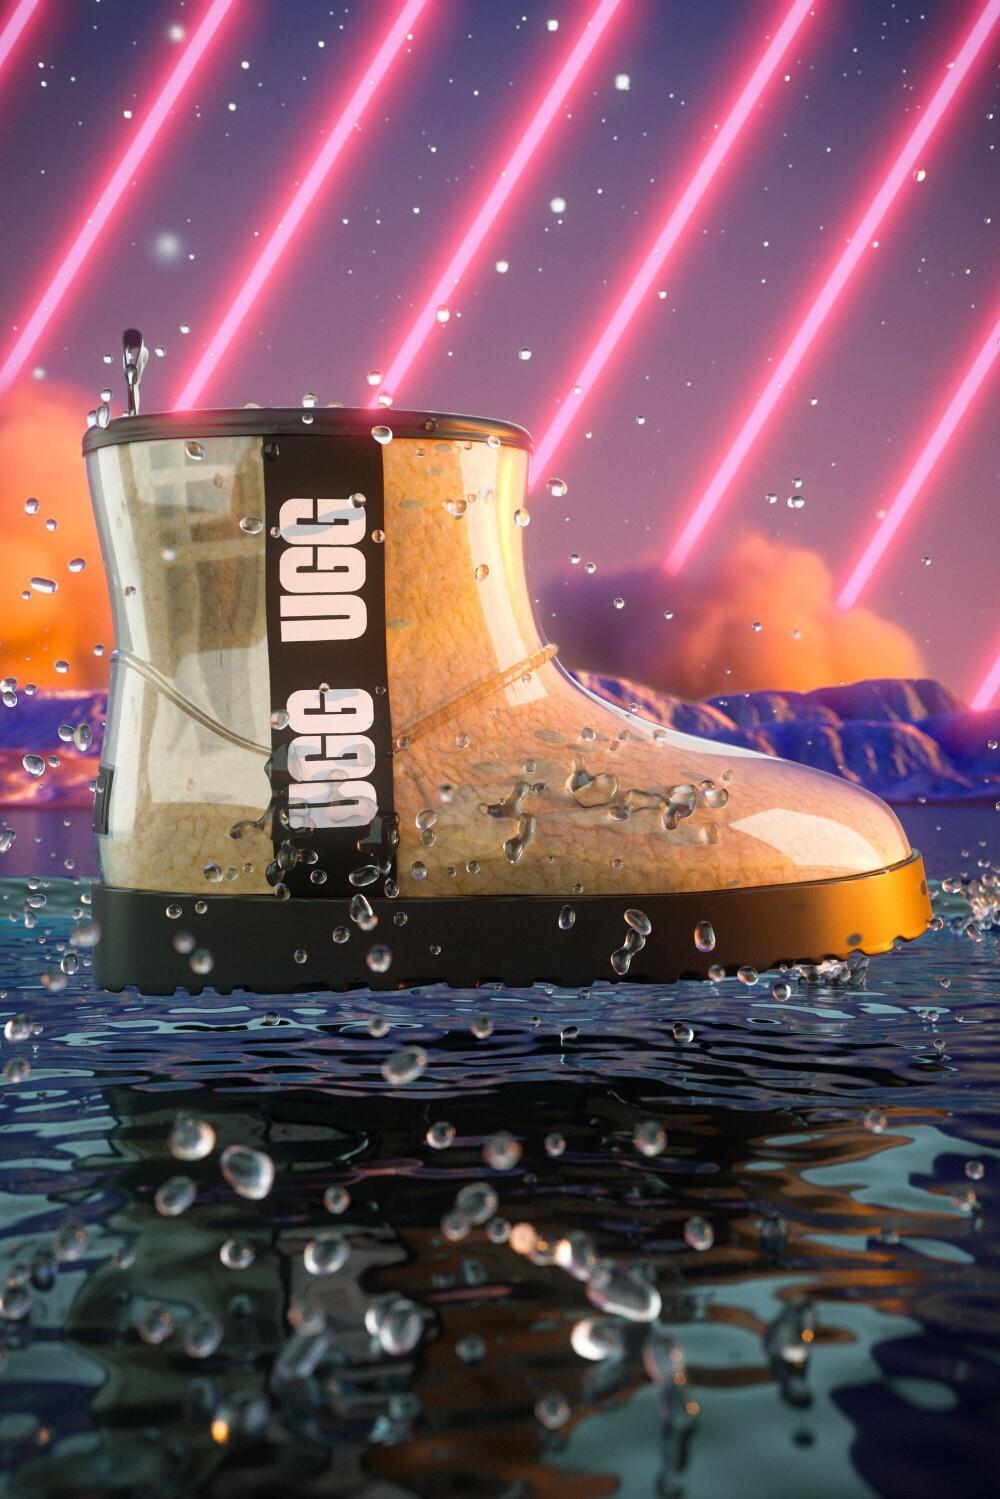 【UGG】話題の防水ブーツのご紹介